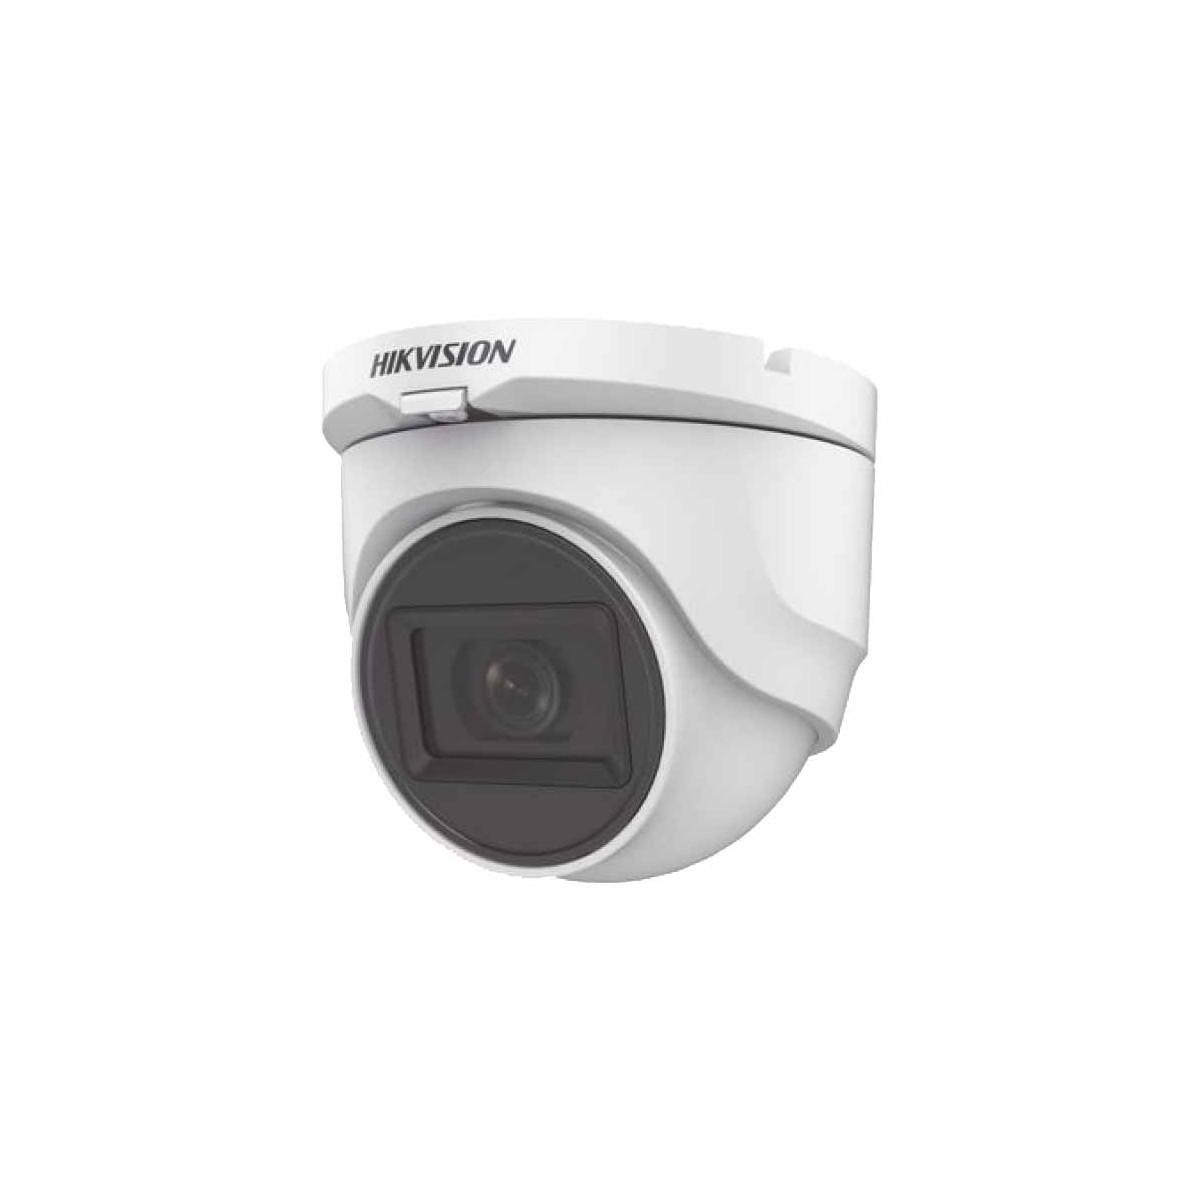 Camera HD-TVI 2MP – Audio Camera